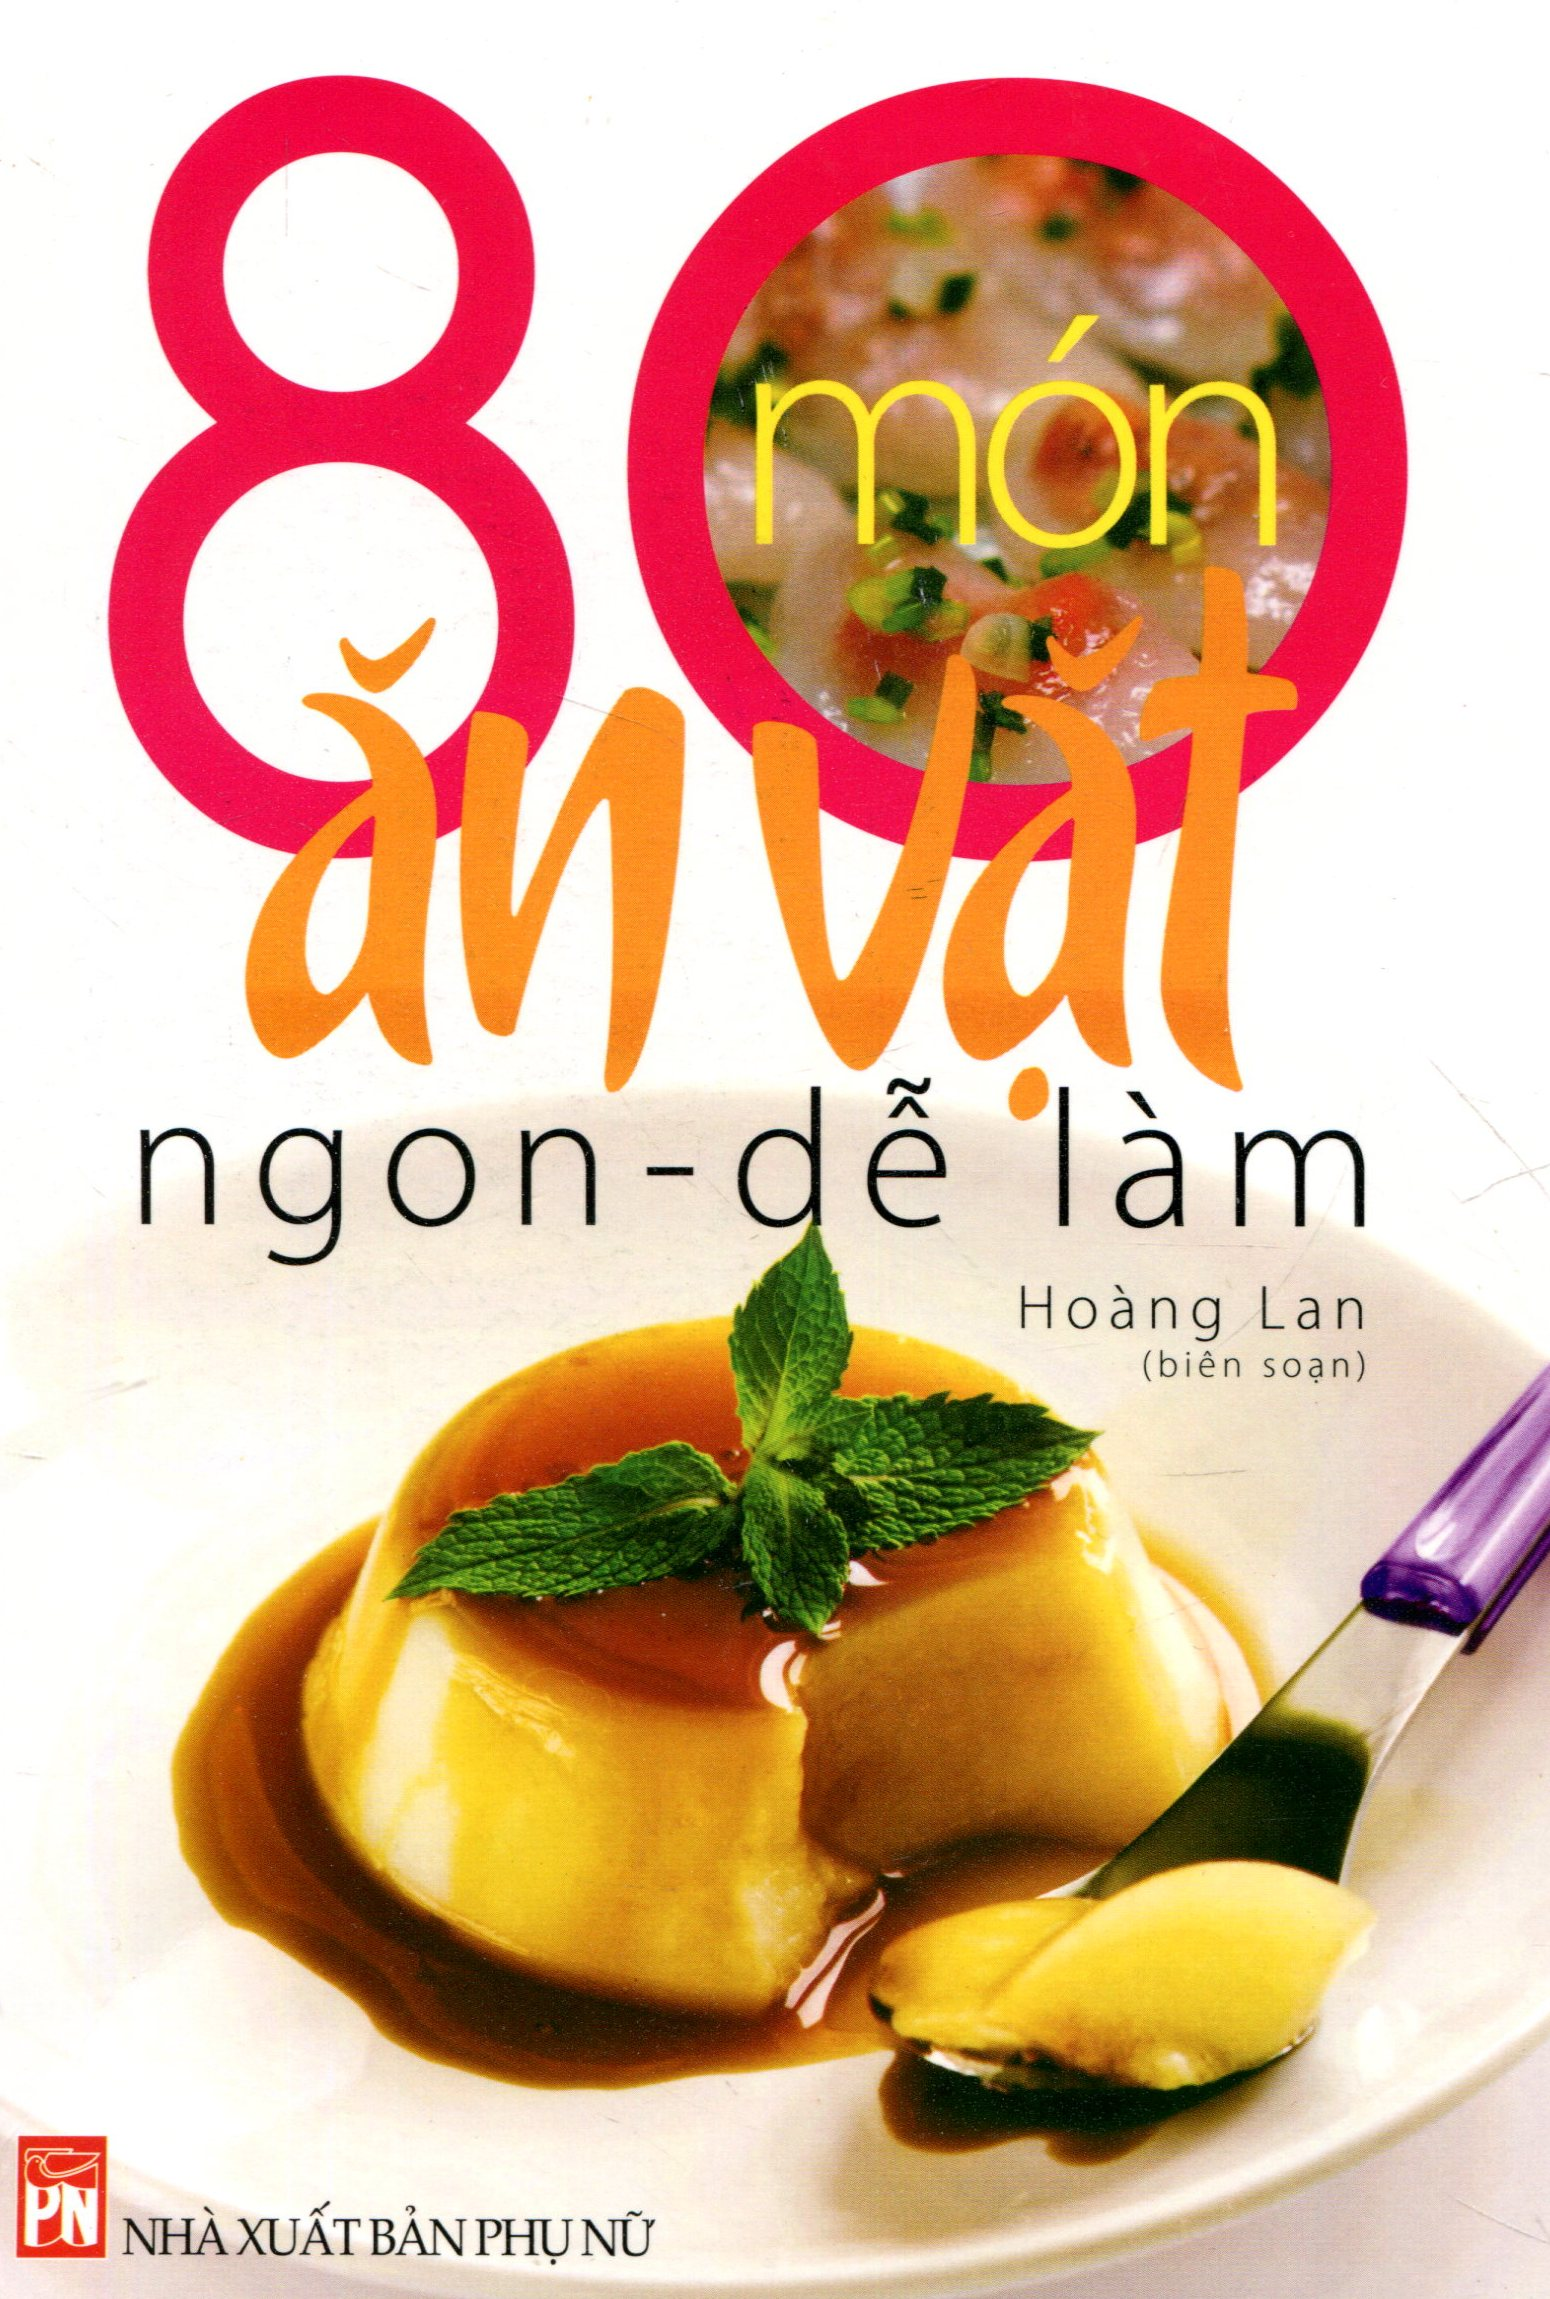 80 Món Ăn Vặt - Ngon, Dễ Làm - Tái bản 2014